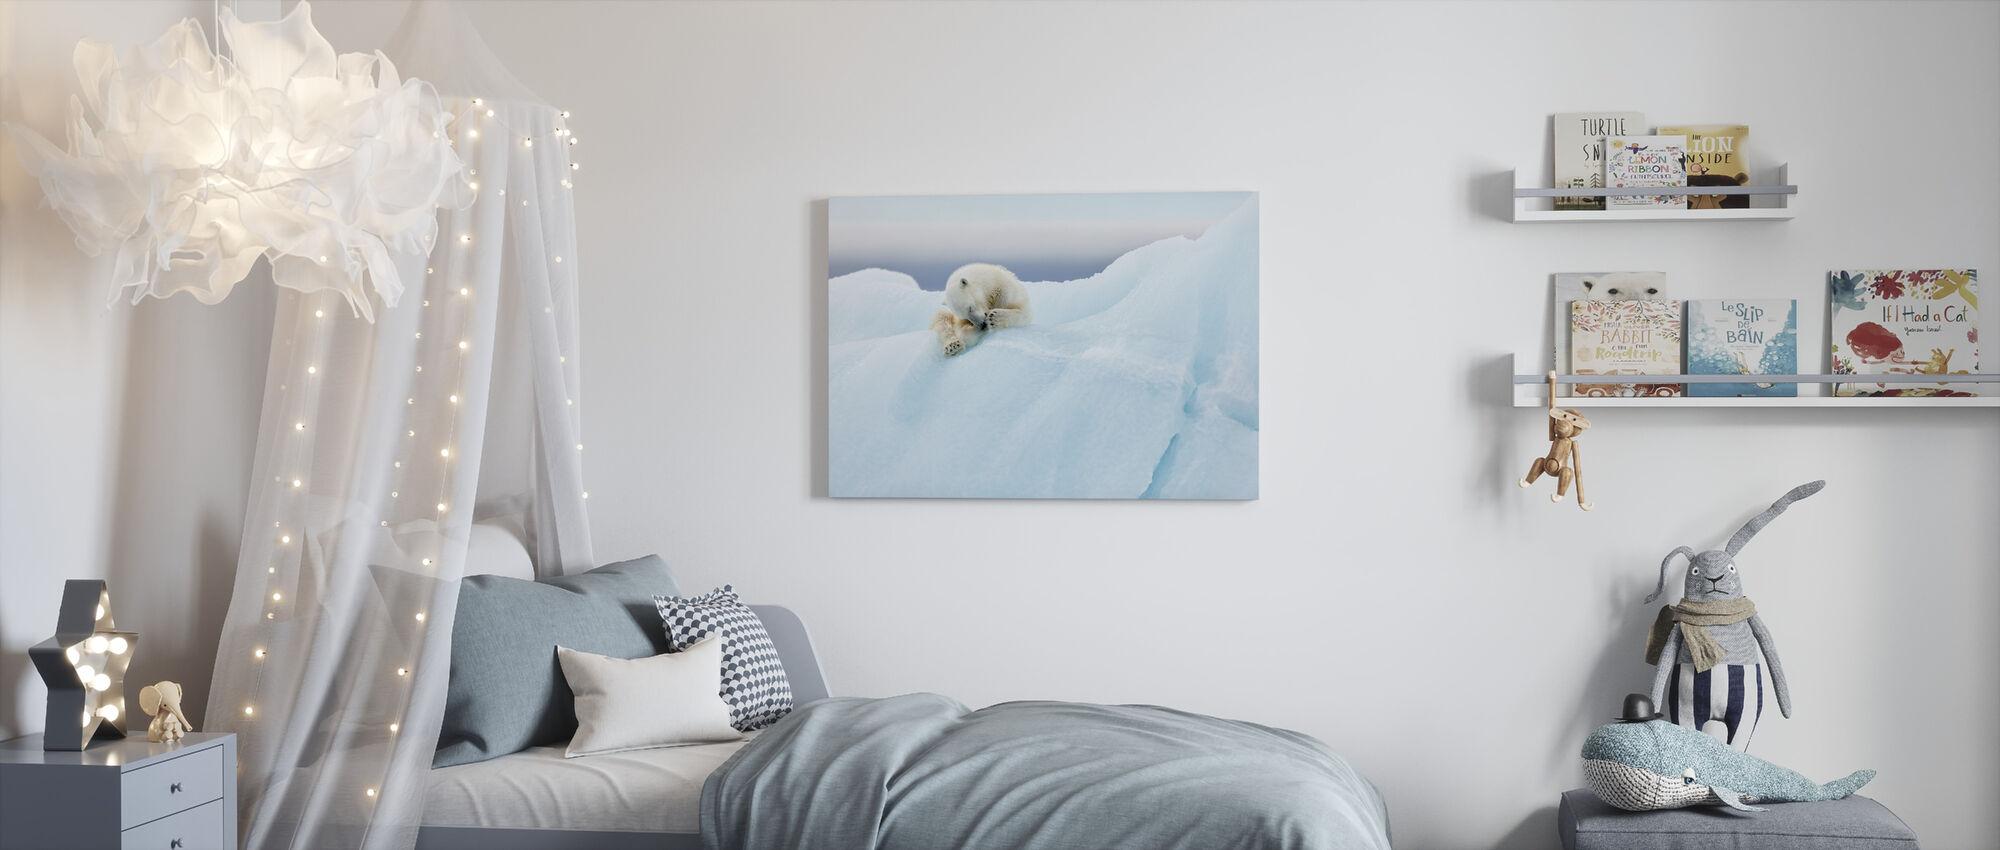 Isbjörn Grooming - Canvastavla - Barnrum